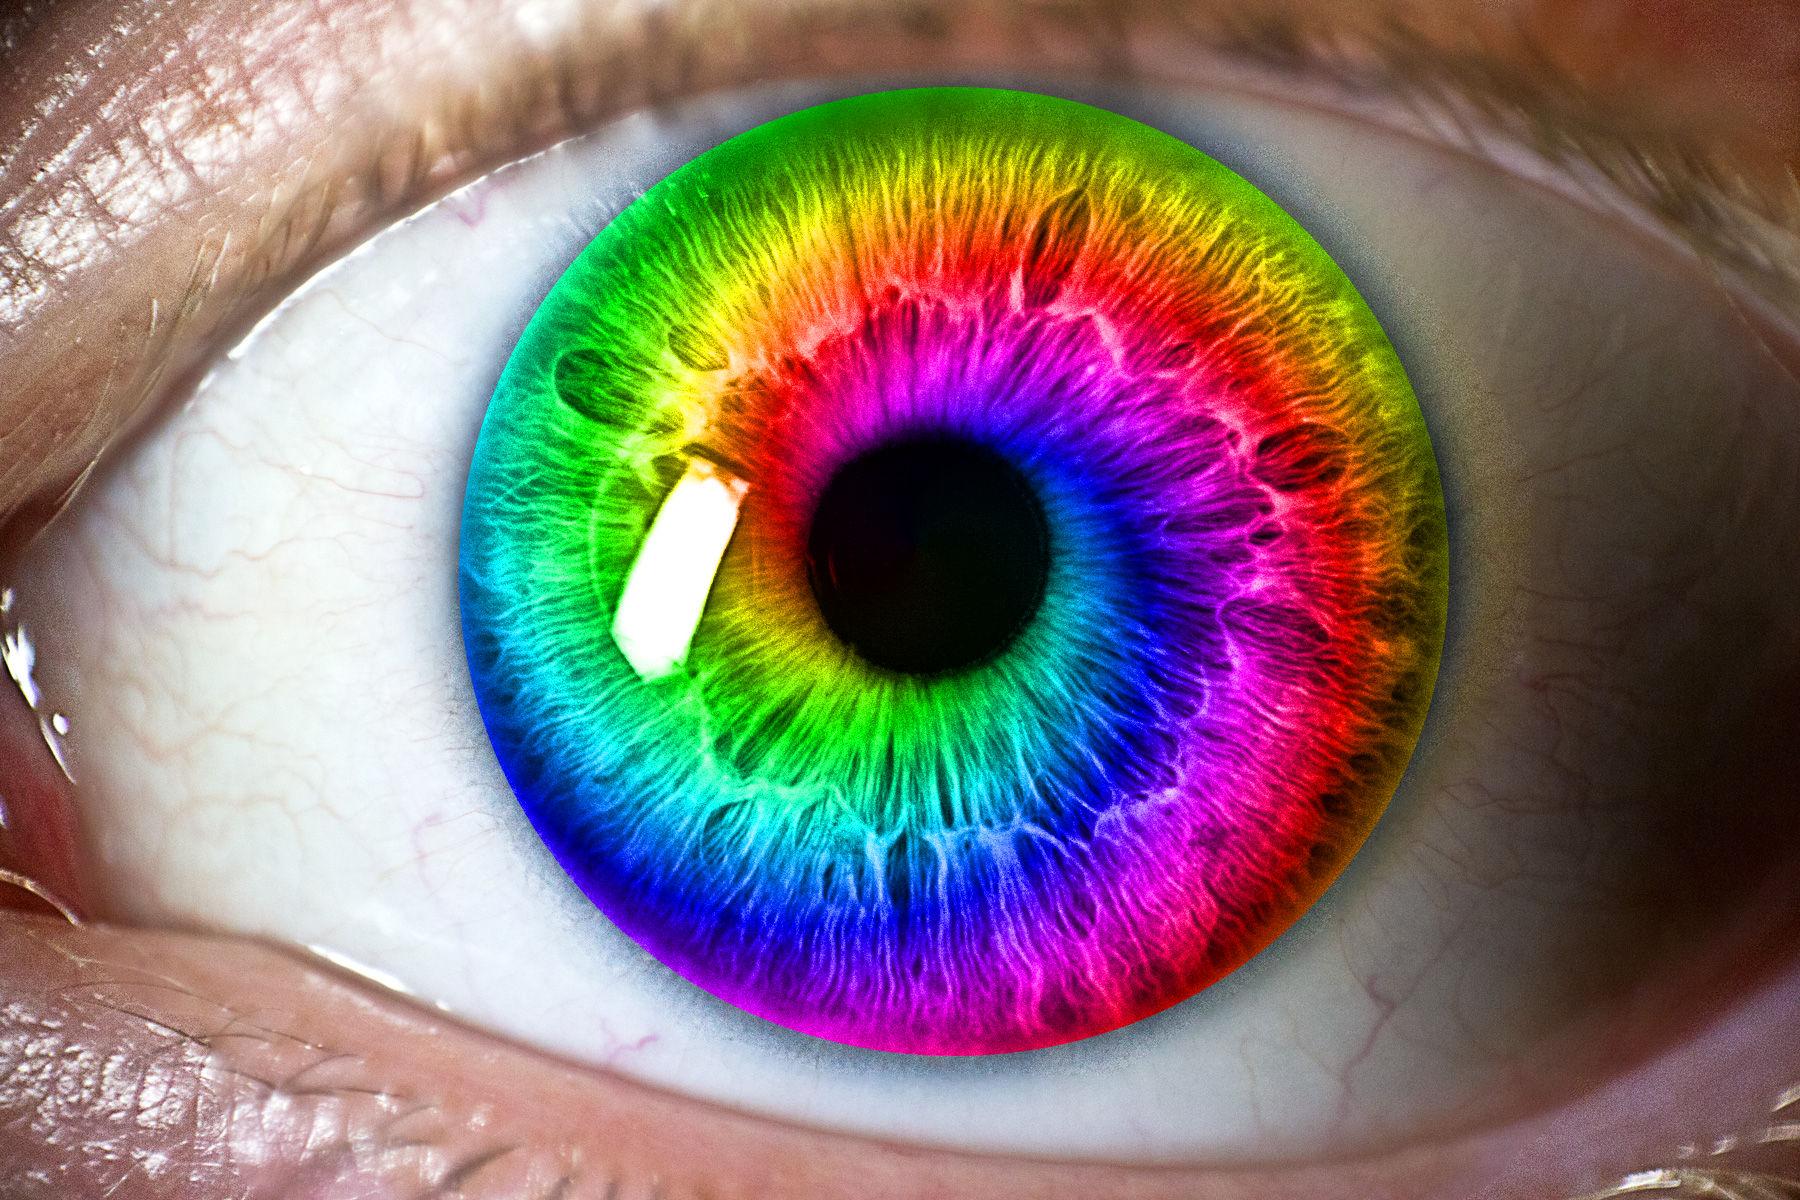 Rainbow Eye by Looking4Llamas on DeviantArt